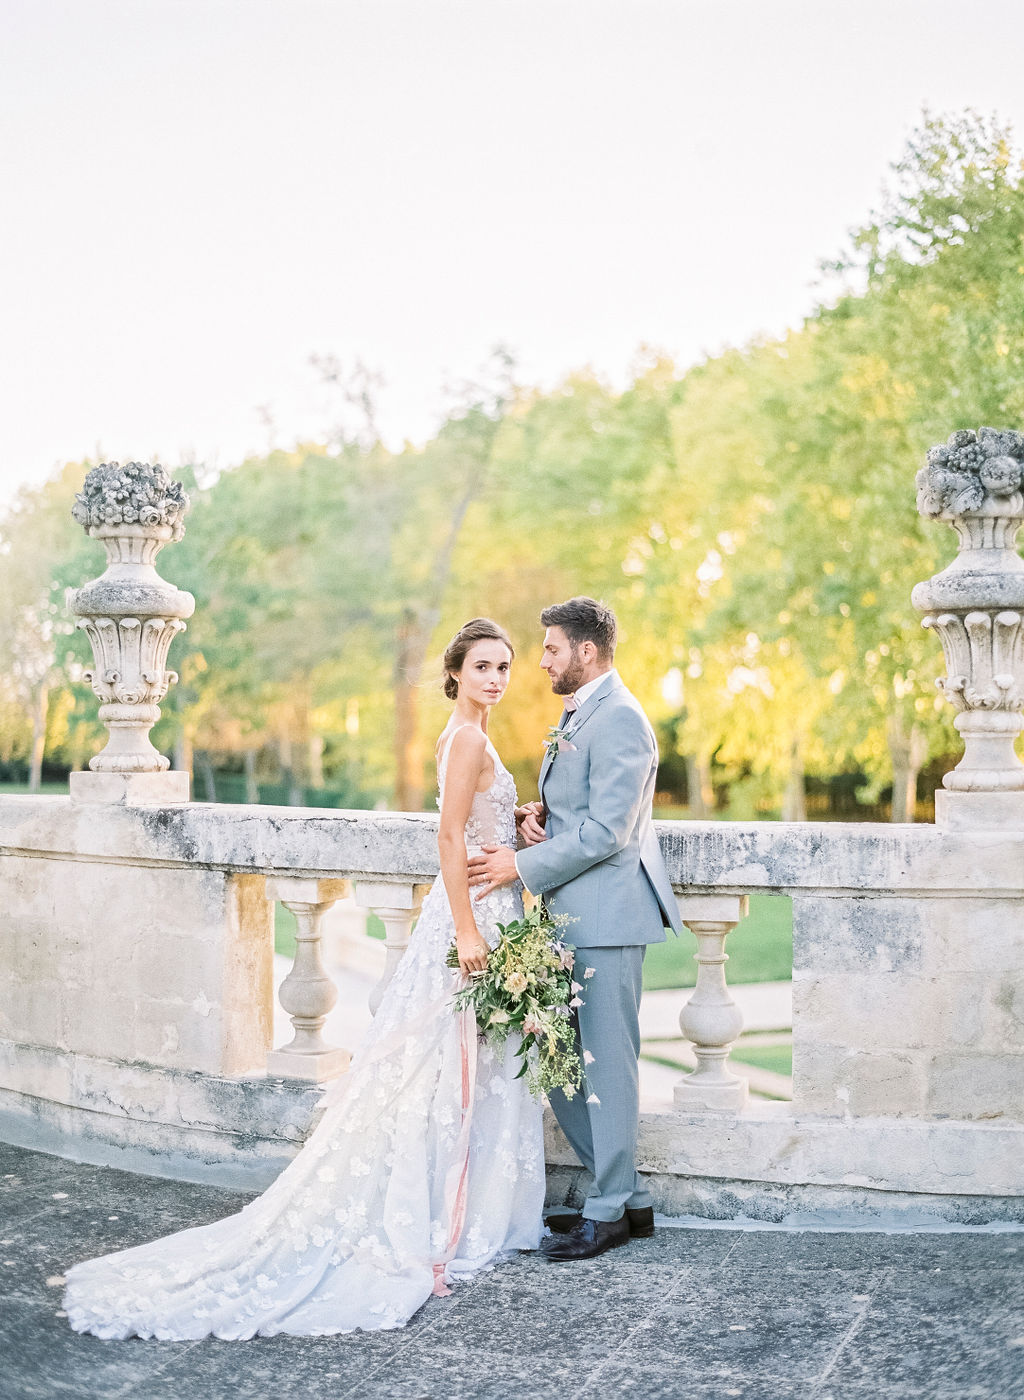 wedding in provence, wedding in france, provence wedding, wedding couple, destination wedding, cheateau de tourreau